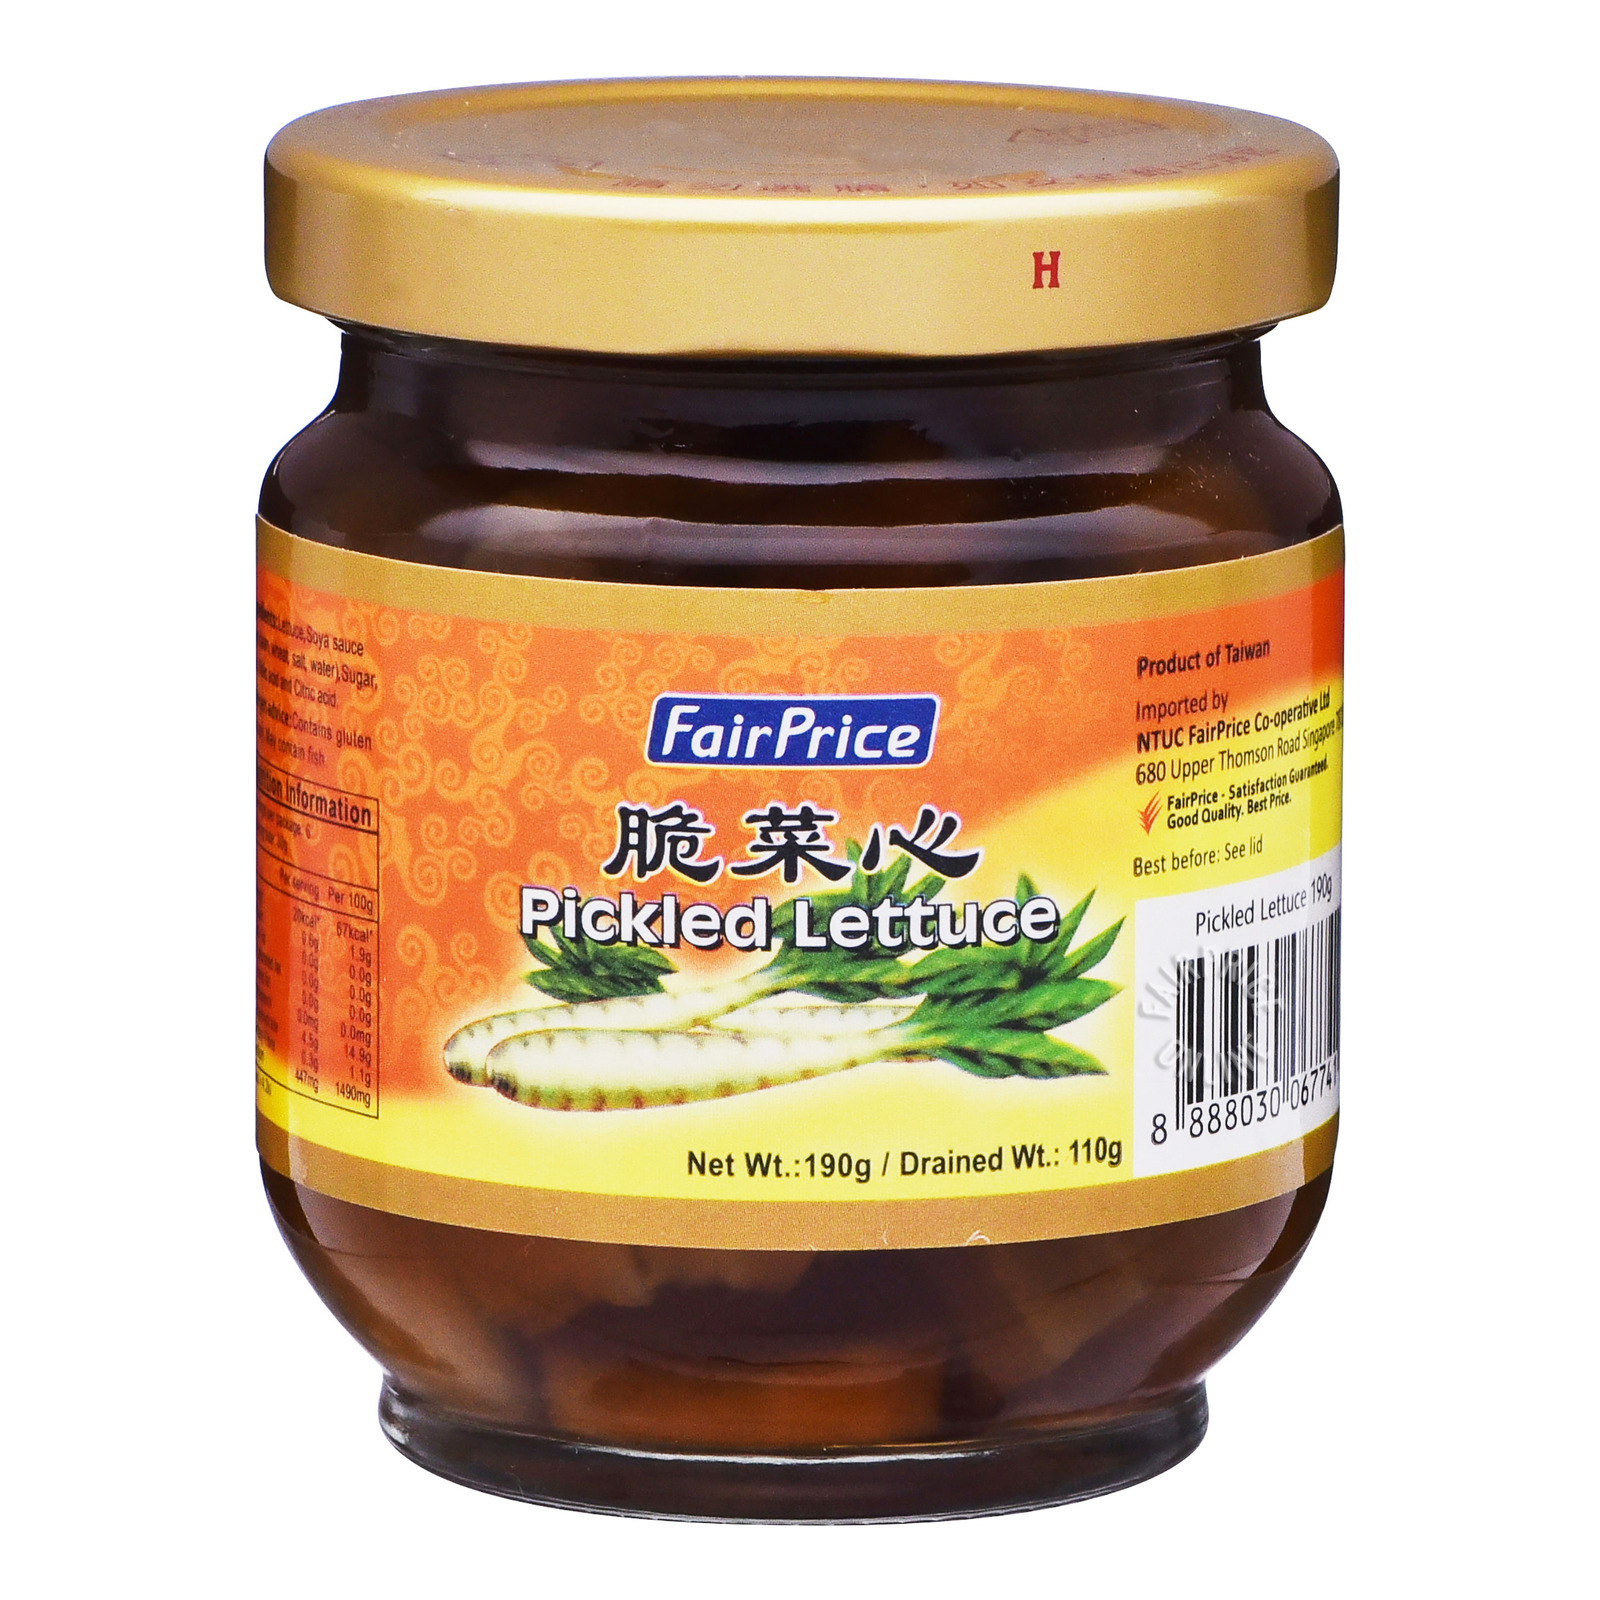 FairPrice Pickled Lettuce